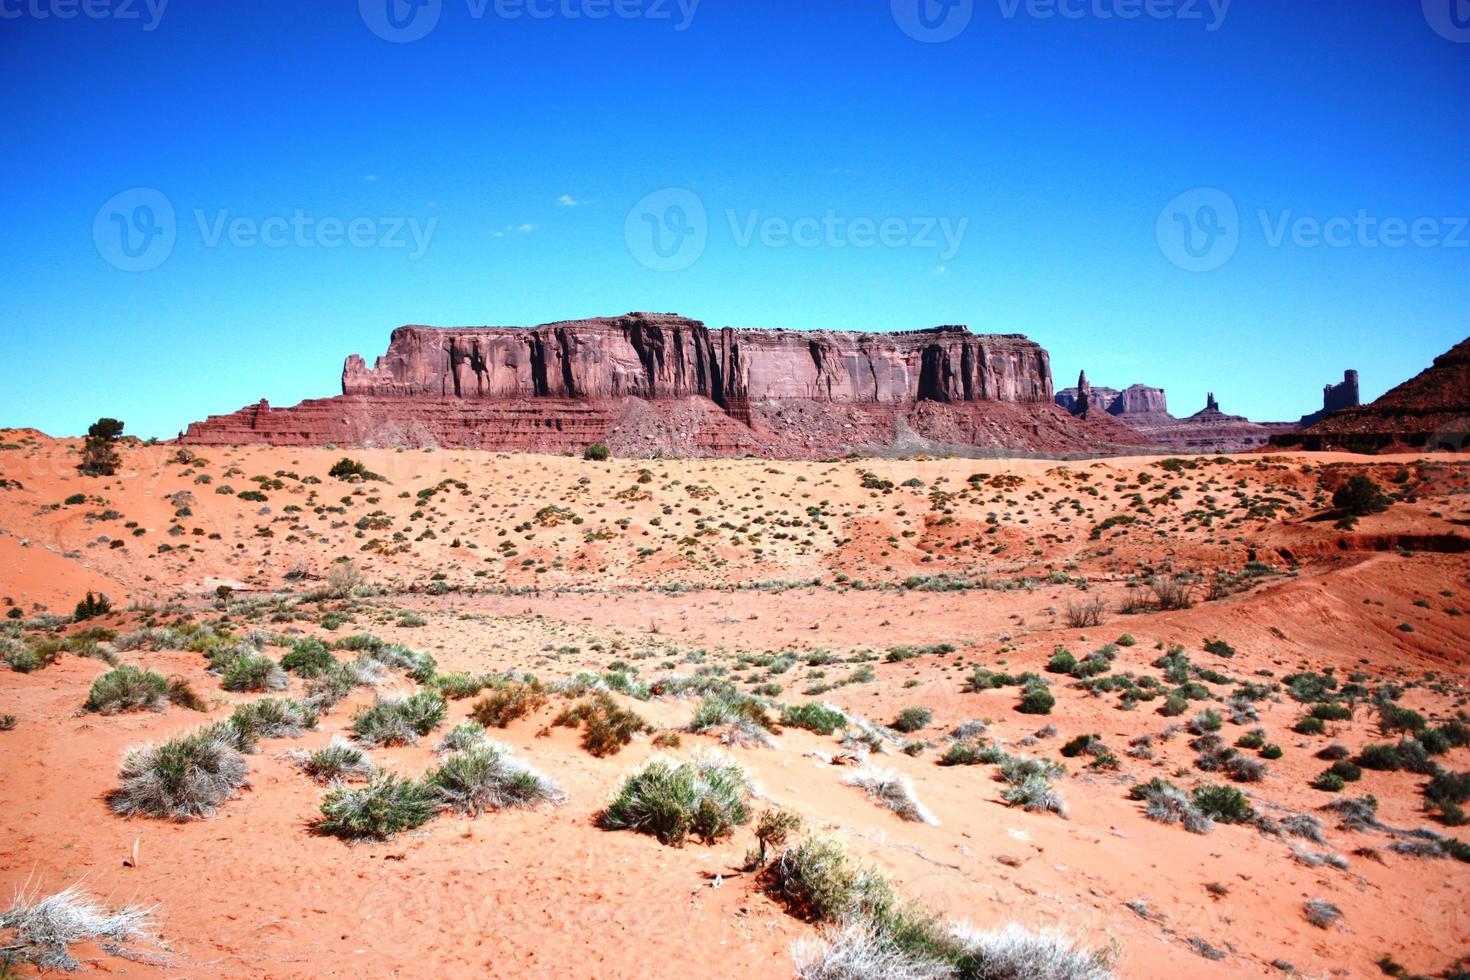 oog op mitchell mesa in monument valley navajo tribal park foto